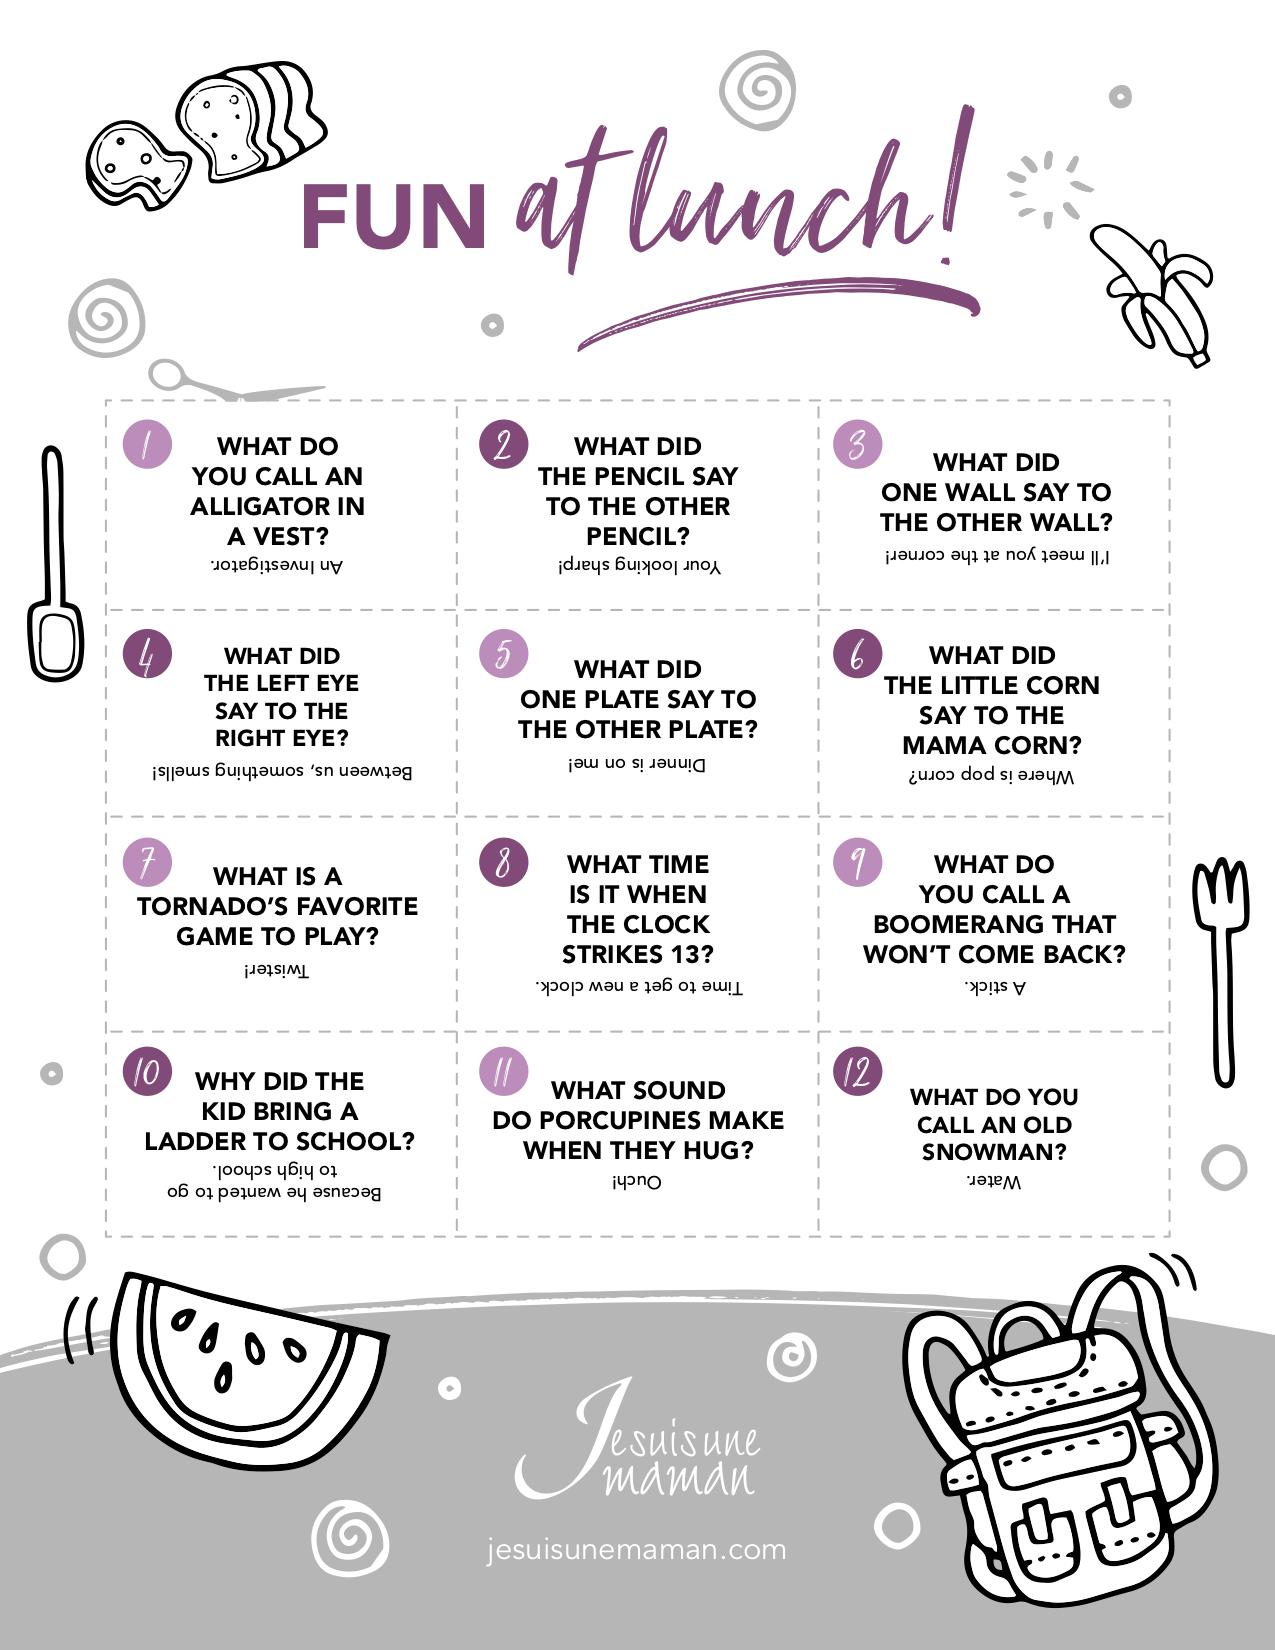 fun at lunch-jokes-kids-school-kidding-Je suis une maman